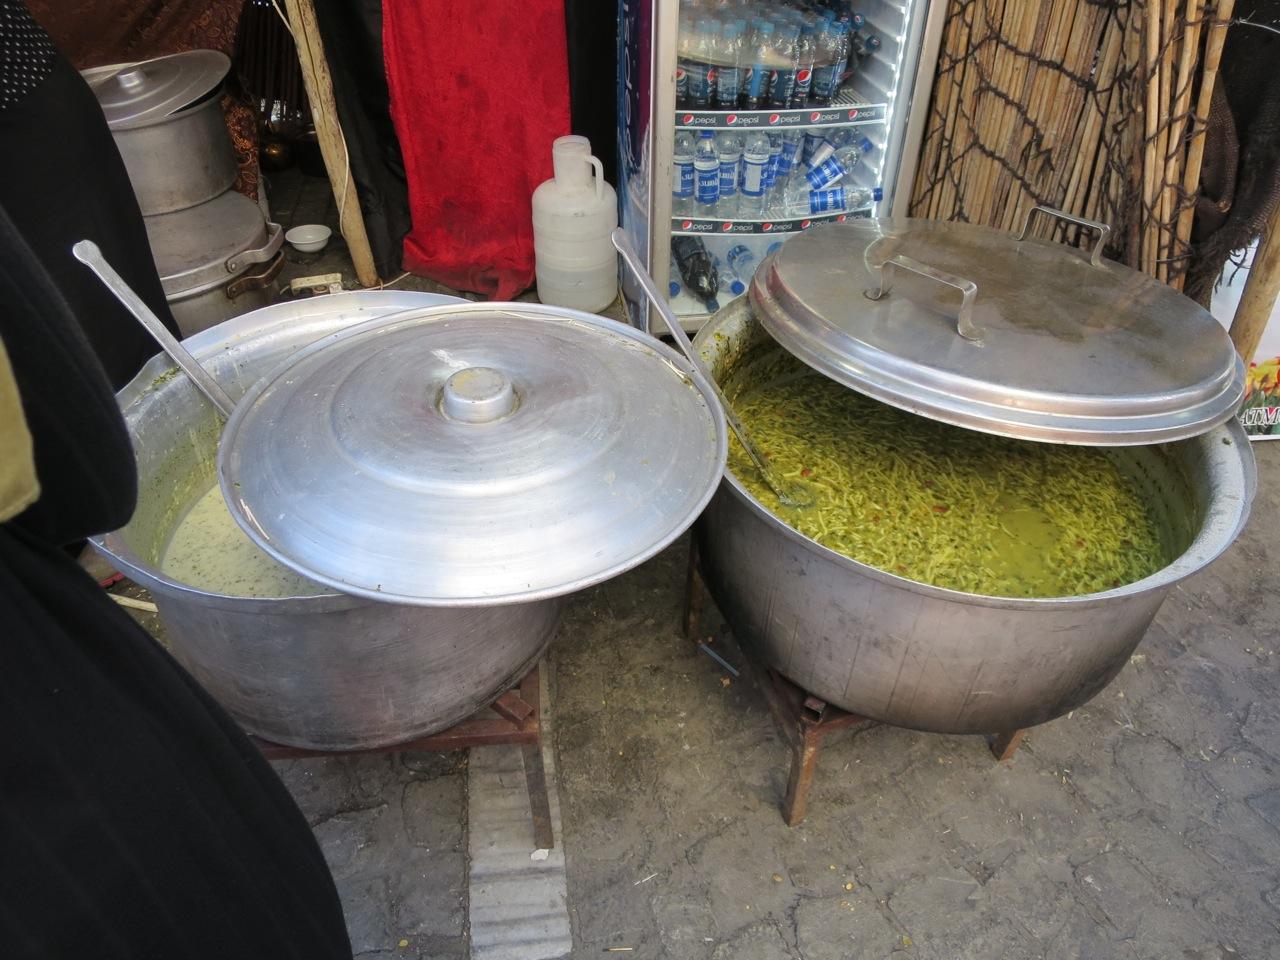 Tehran 1-12